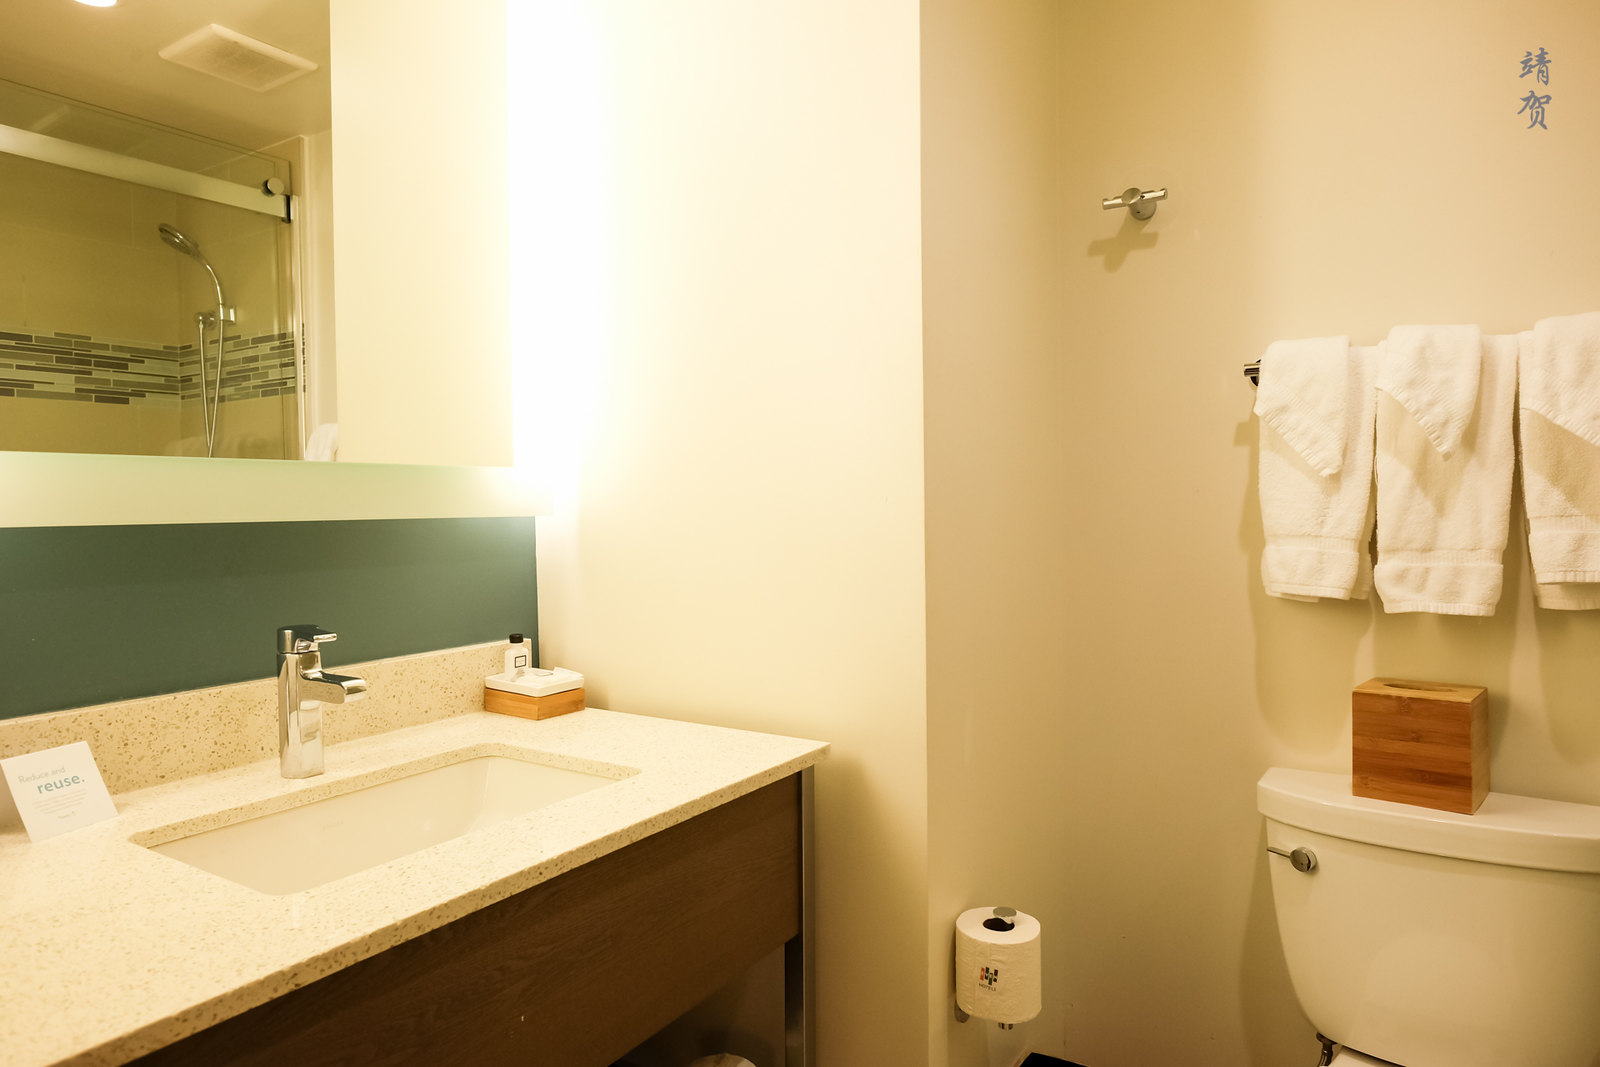 Countertop in the bathroom